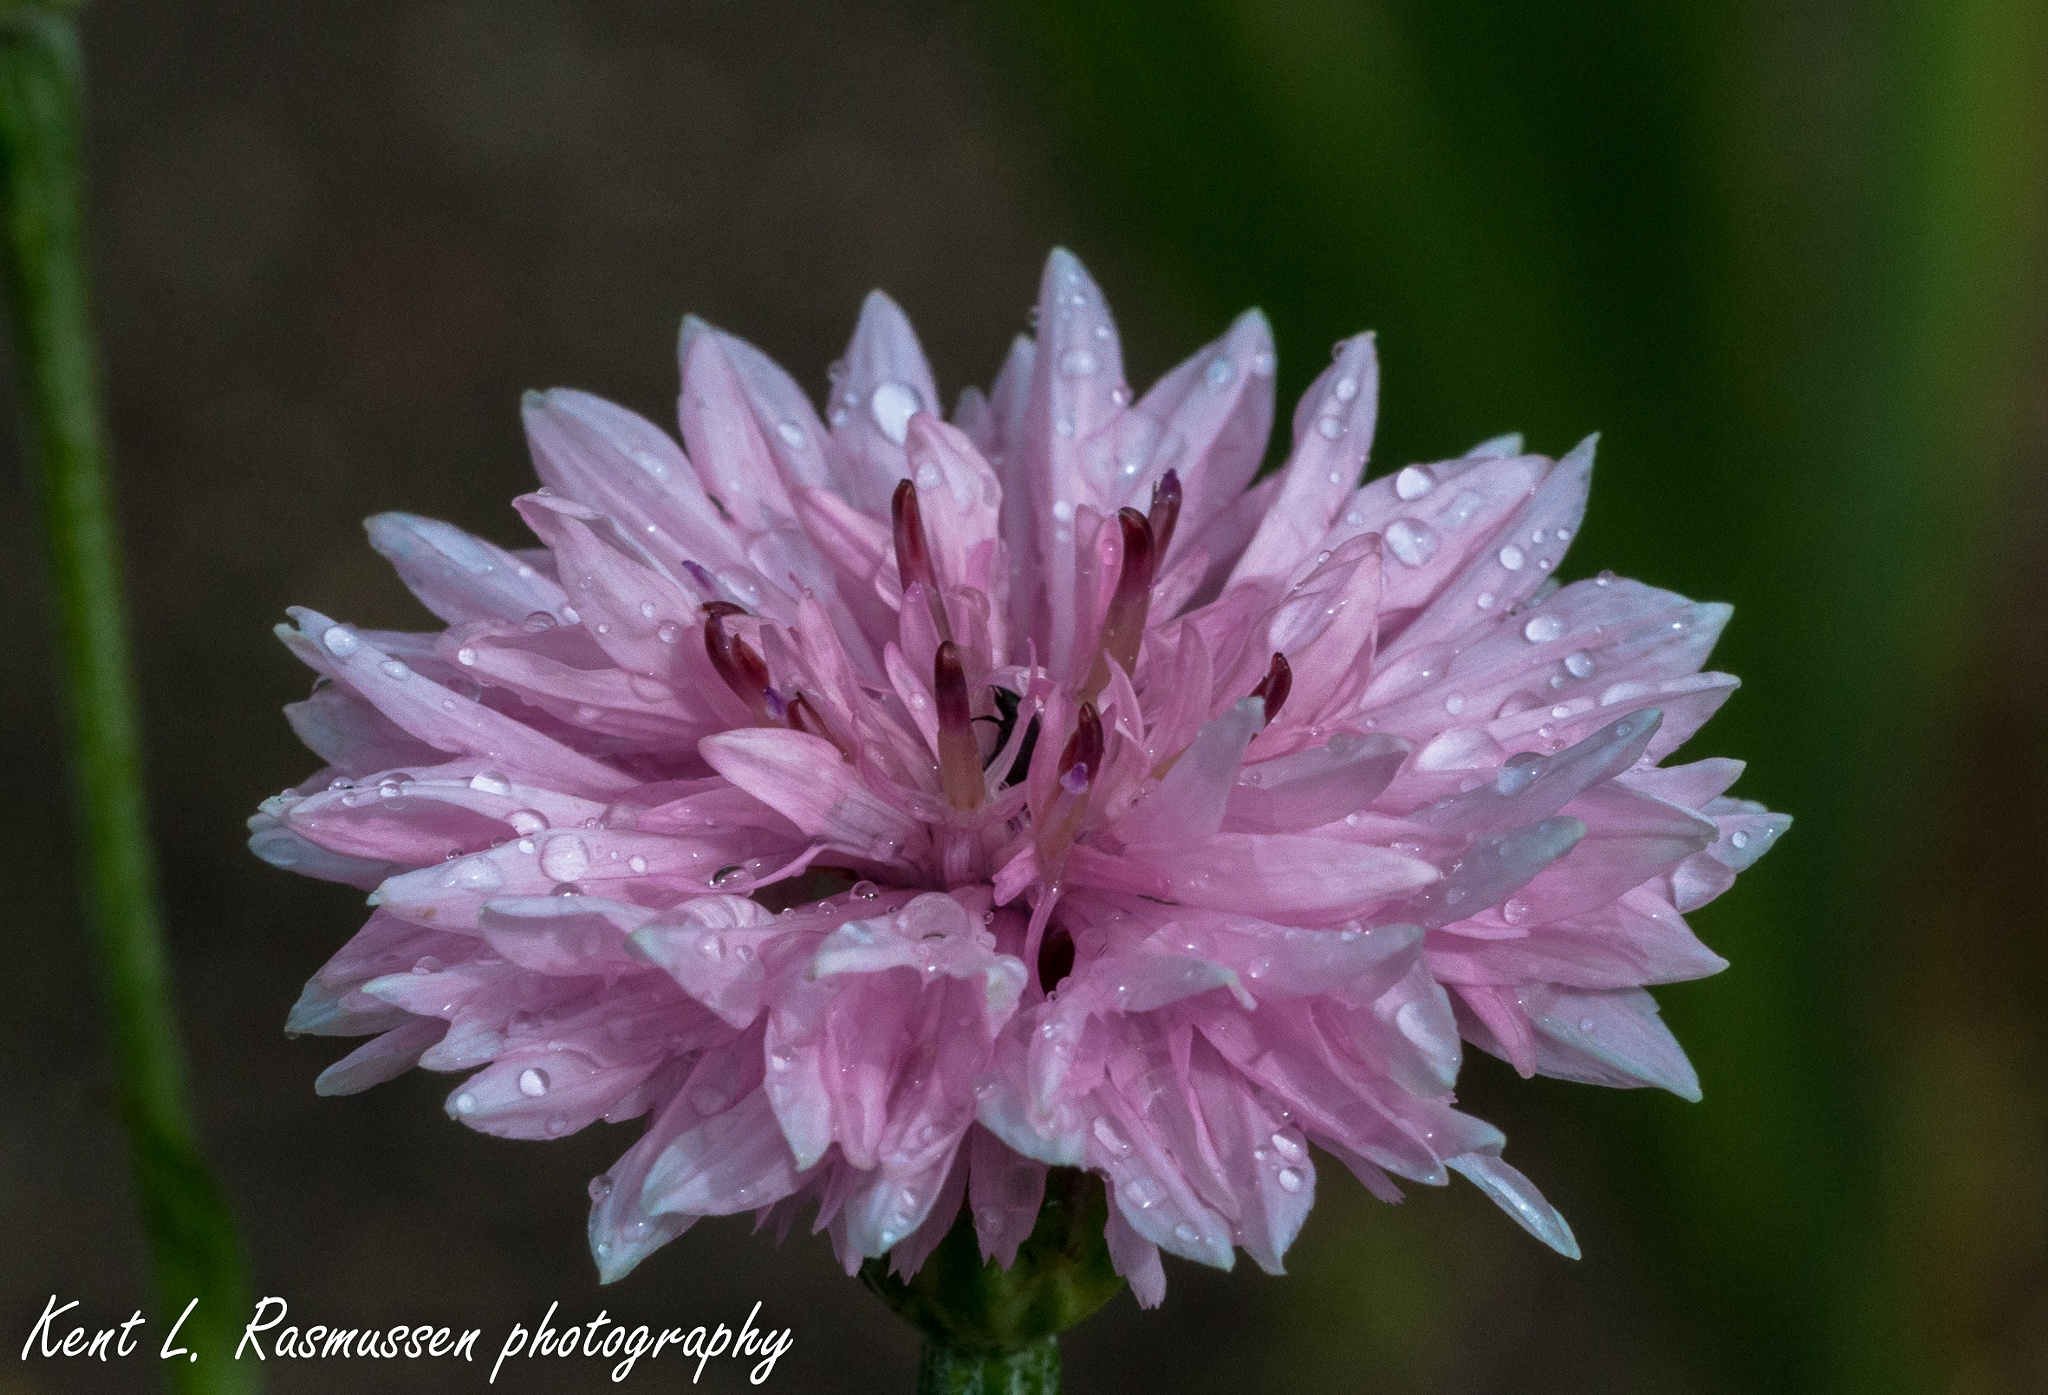 Pink corn flower in the rain by Kent L. Rasmussen